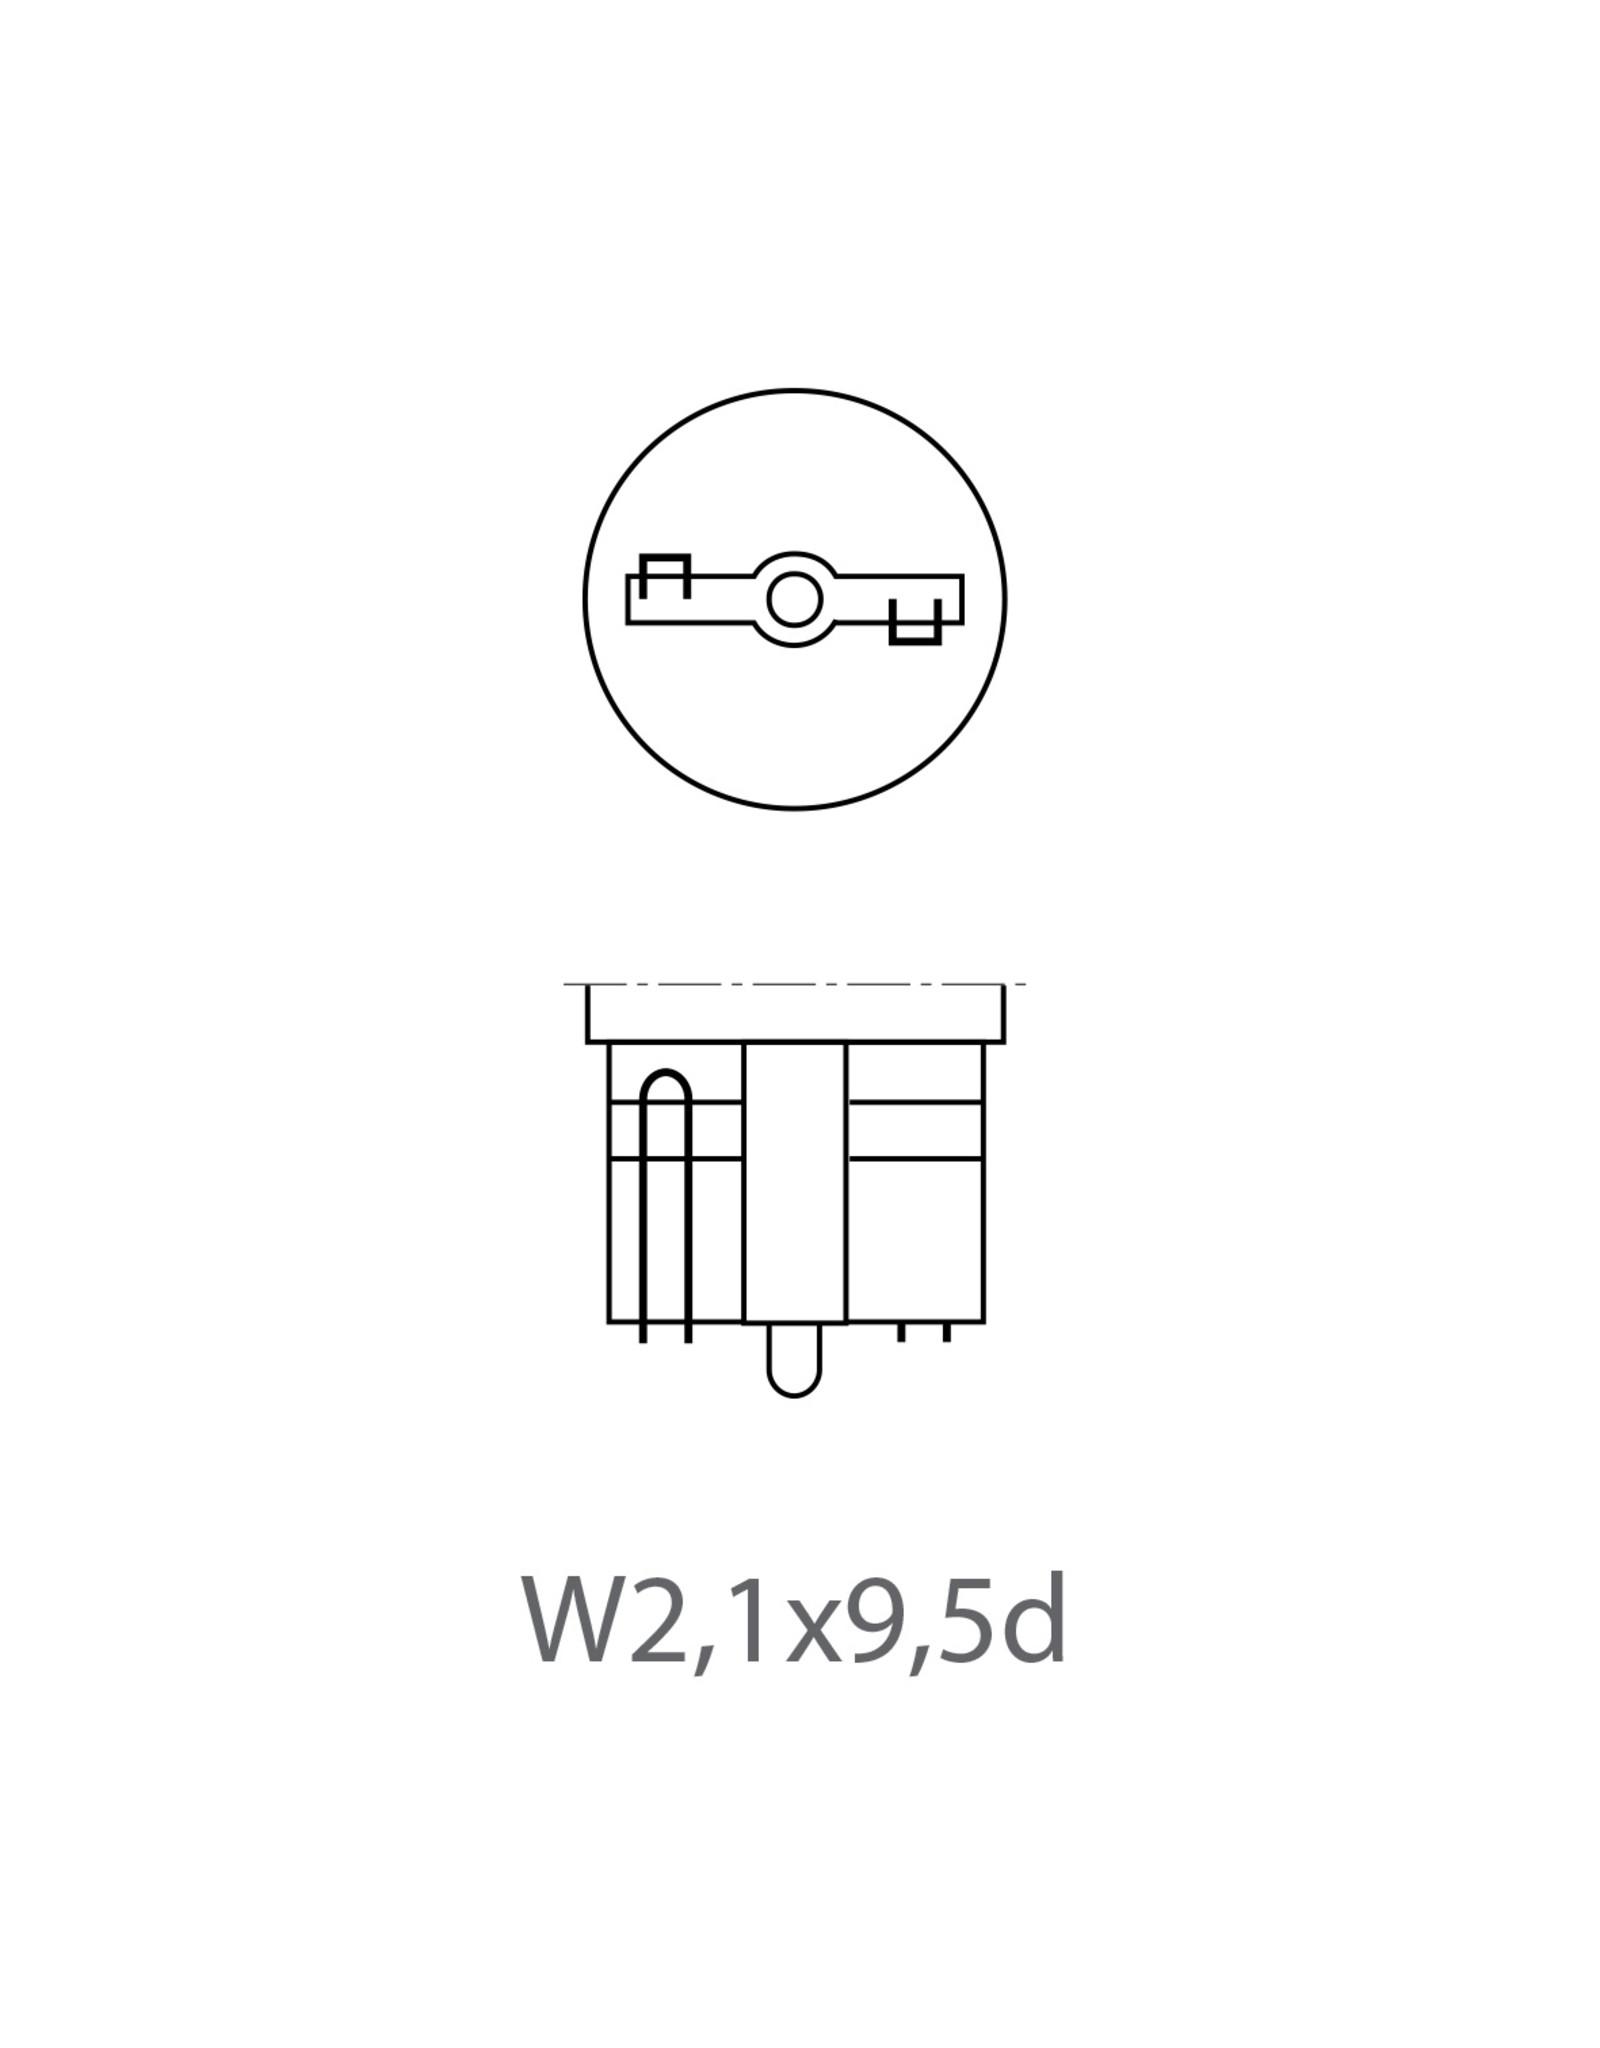 Autolamp 12V 3W T10 W2,1x9,5d 2x